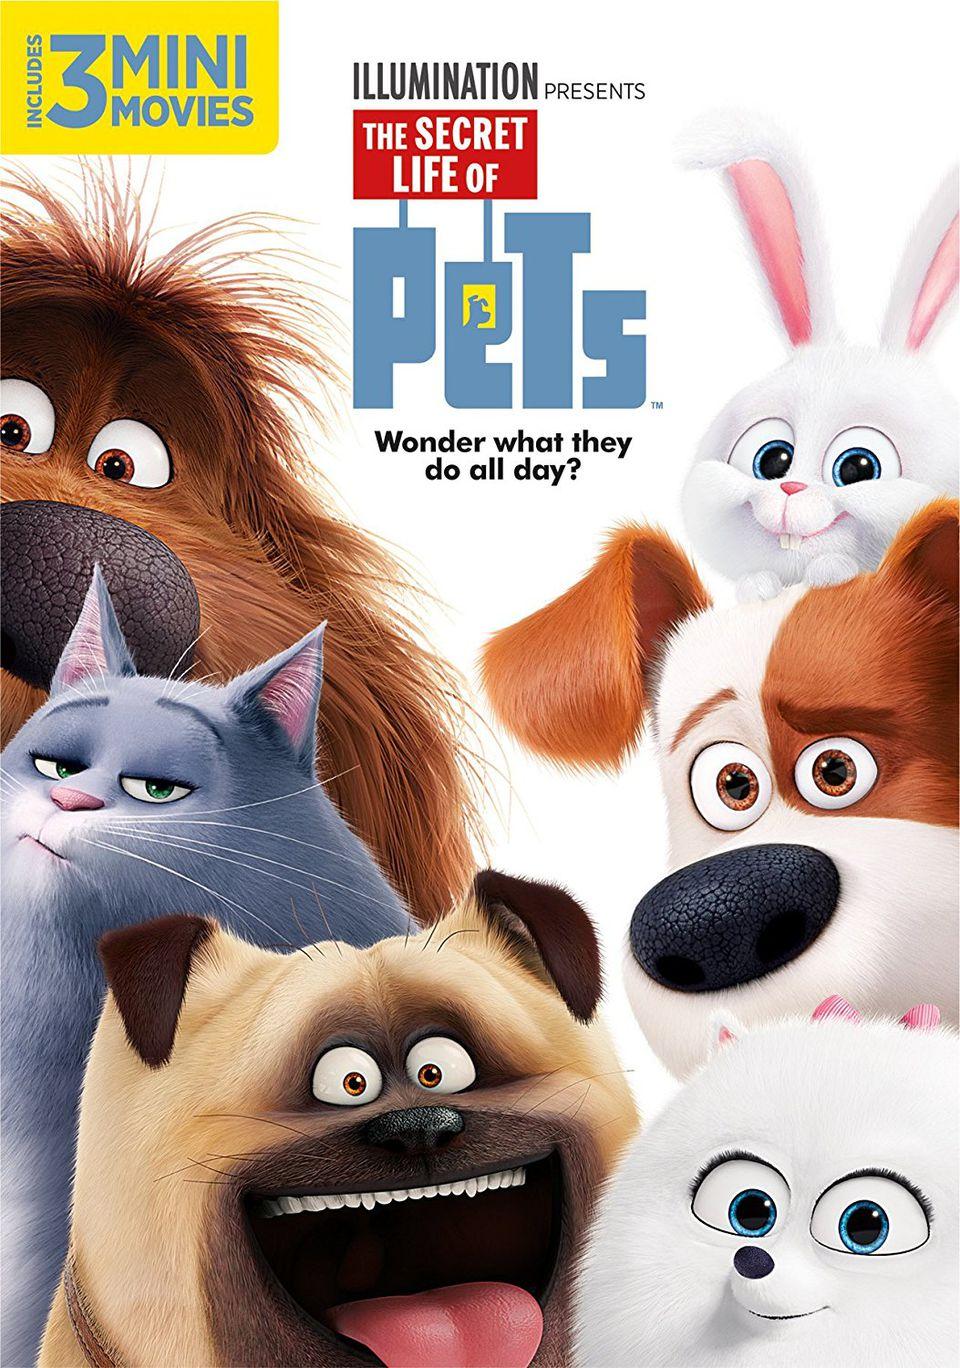 The secret life of pets dog movie